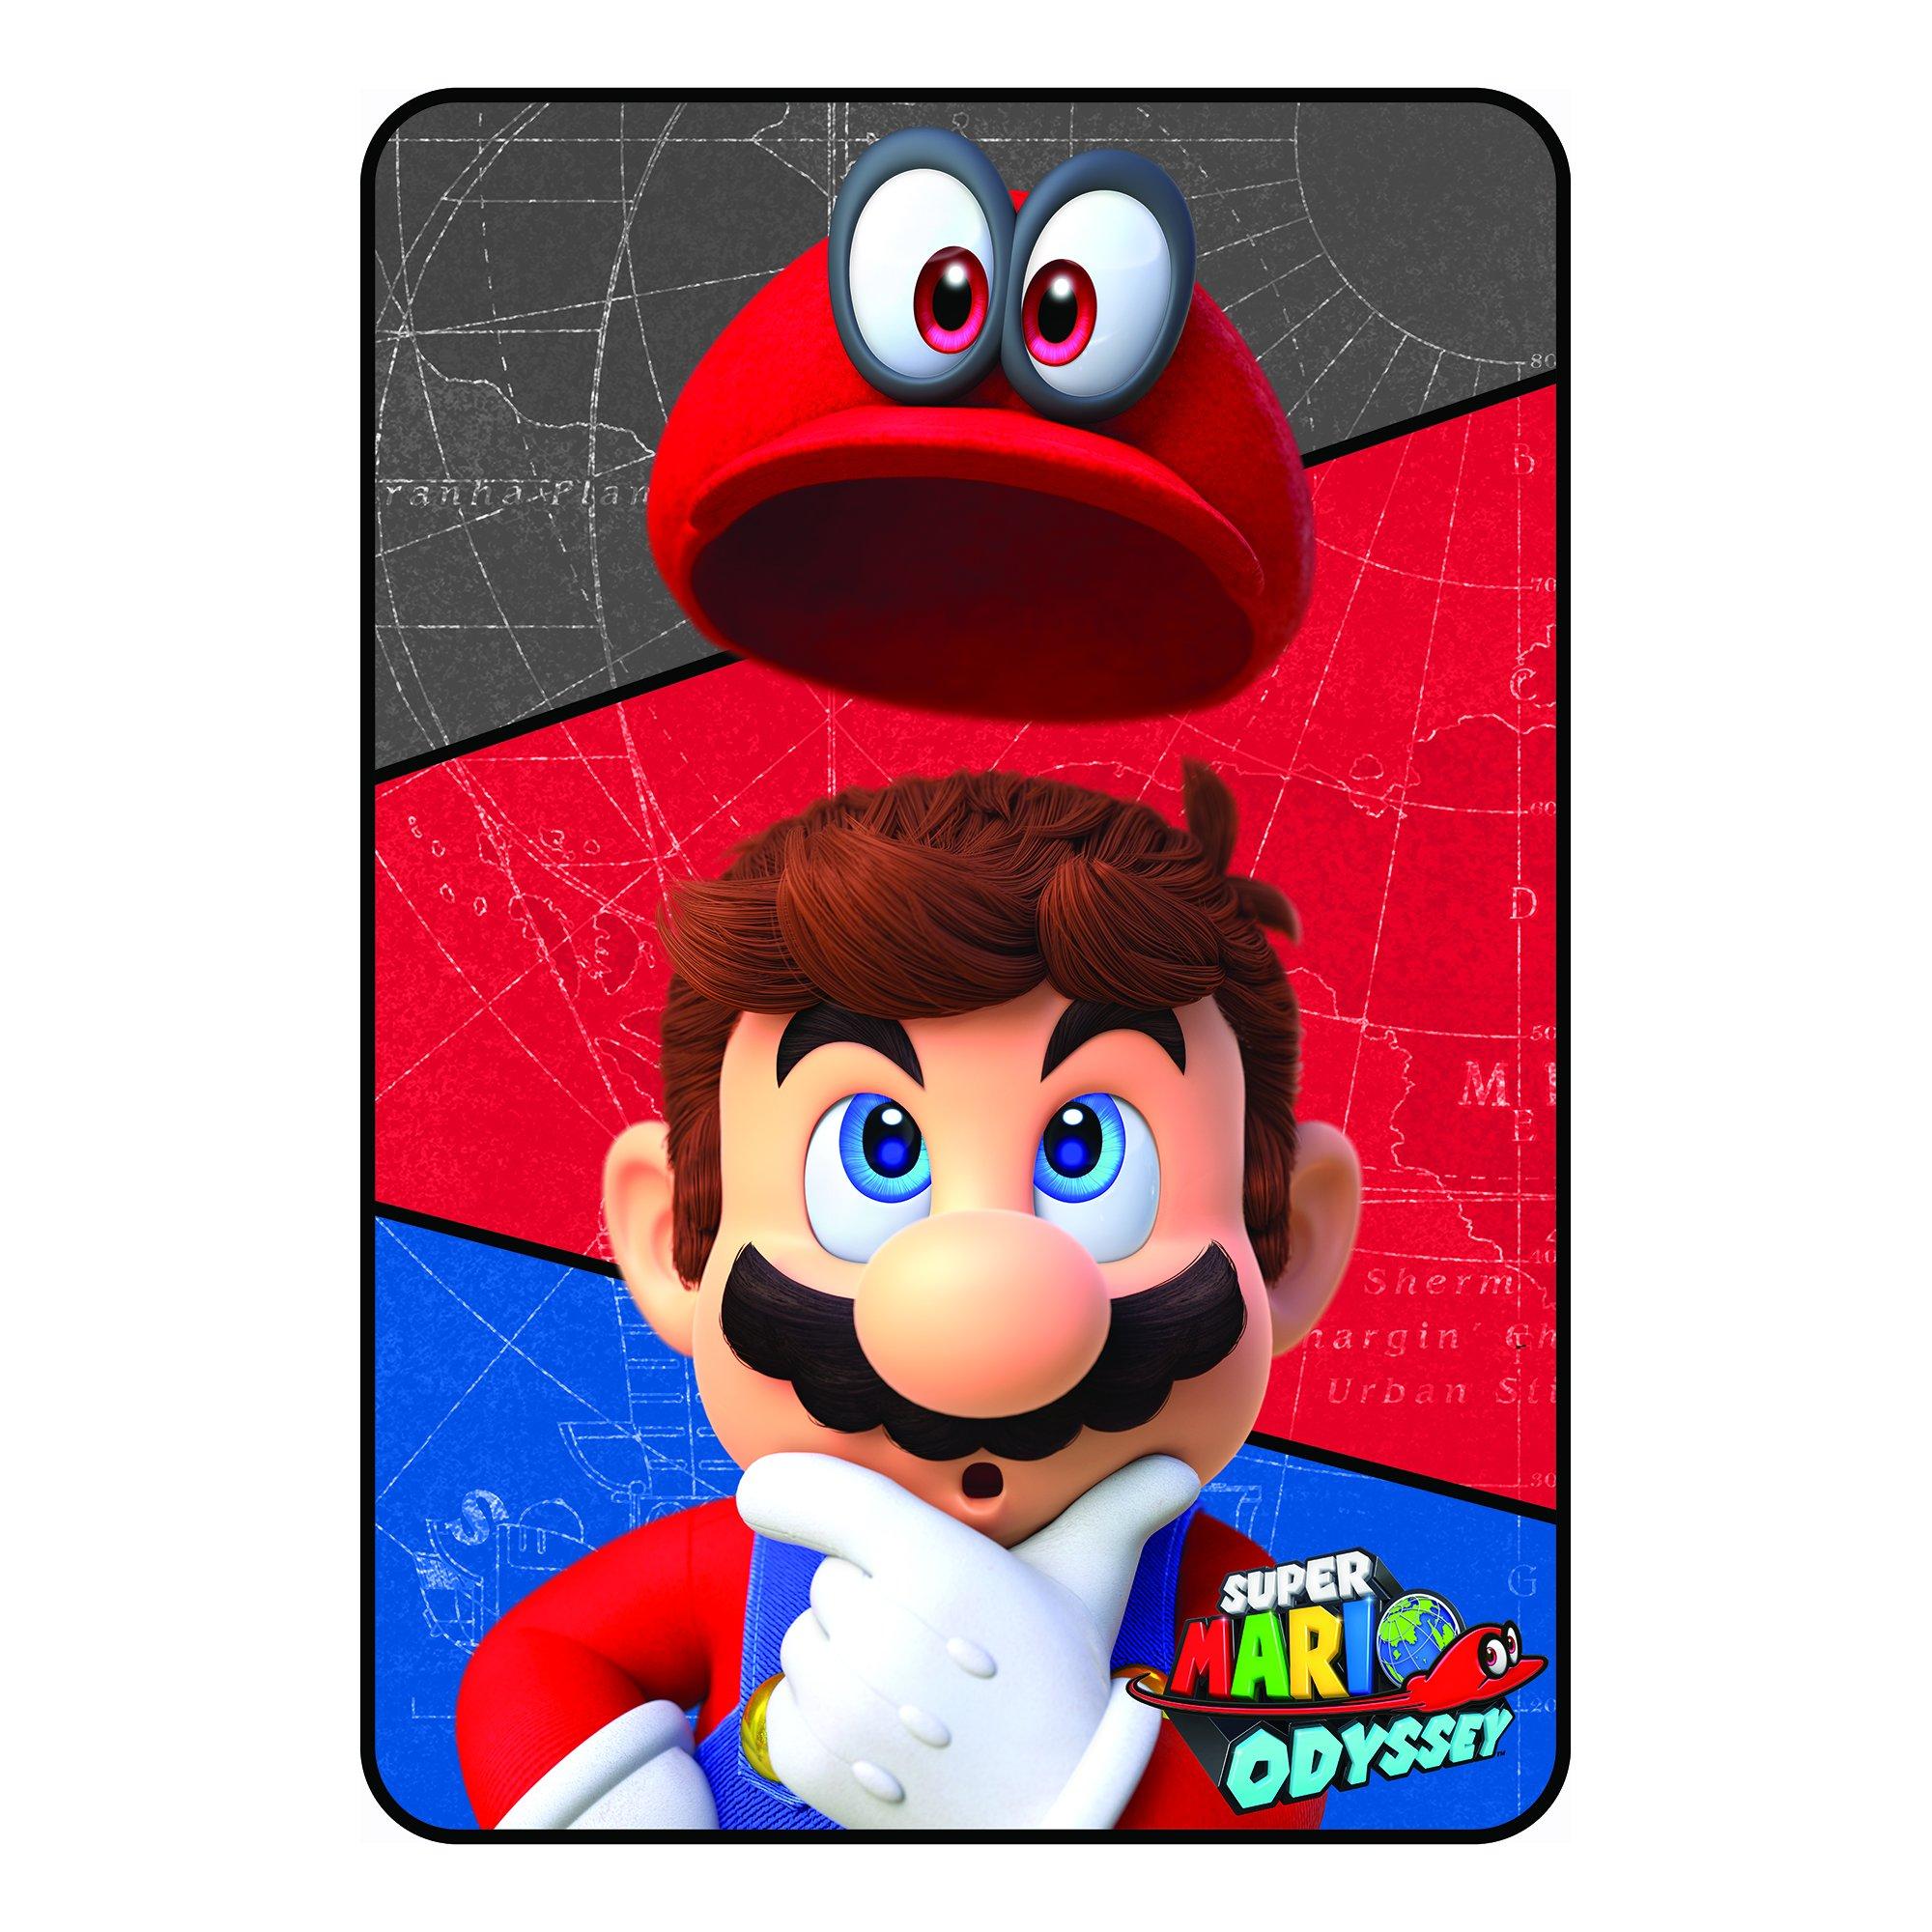 Nintendo Super Mario World Microraschel Blanket, 62 x 90